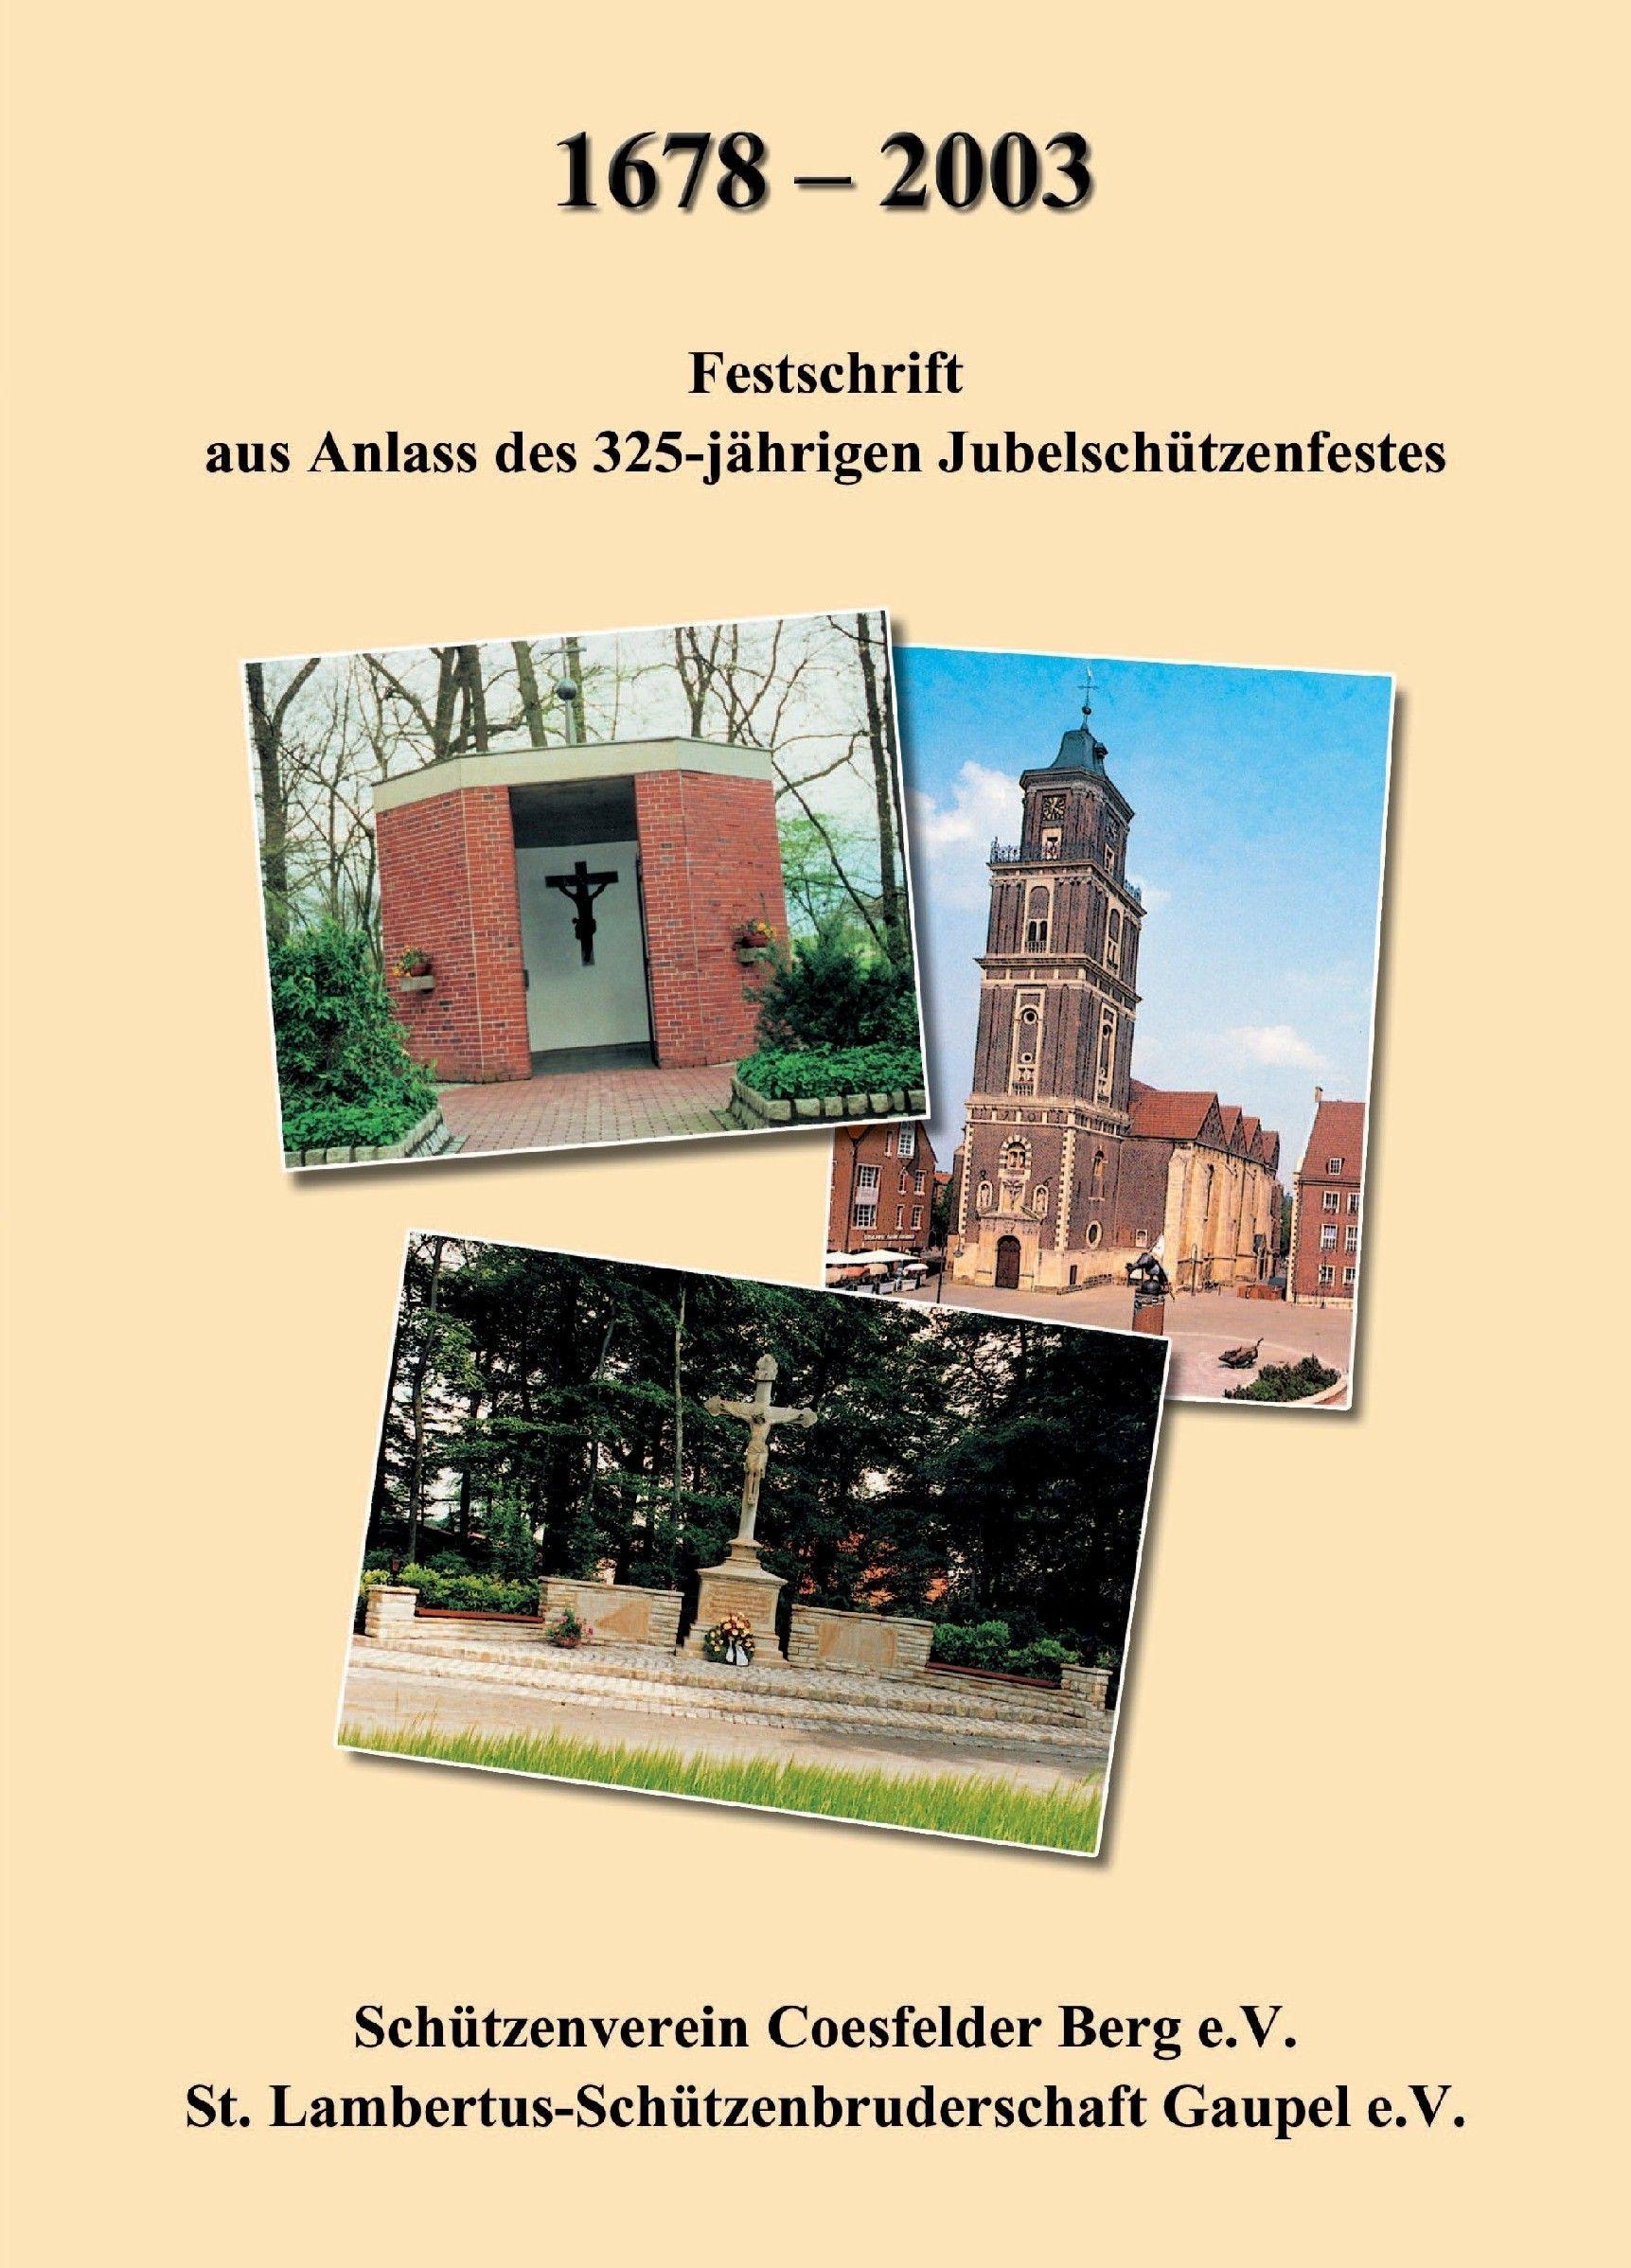 Festzeitschrift aus Anlass des 325-jährigen